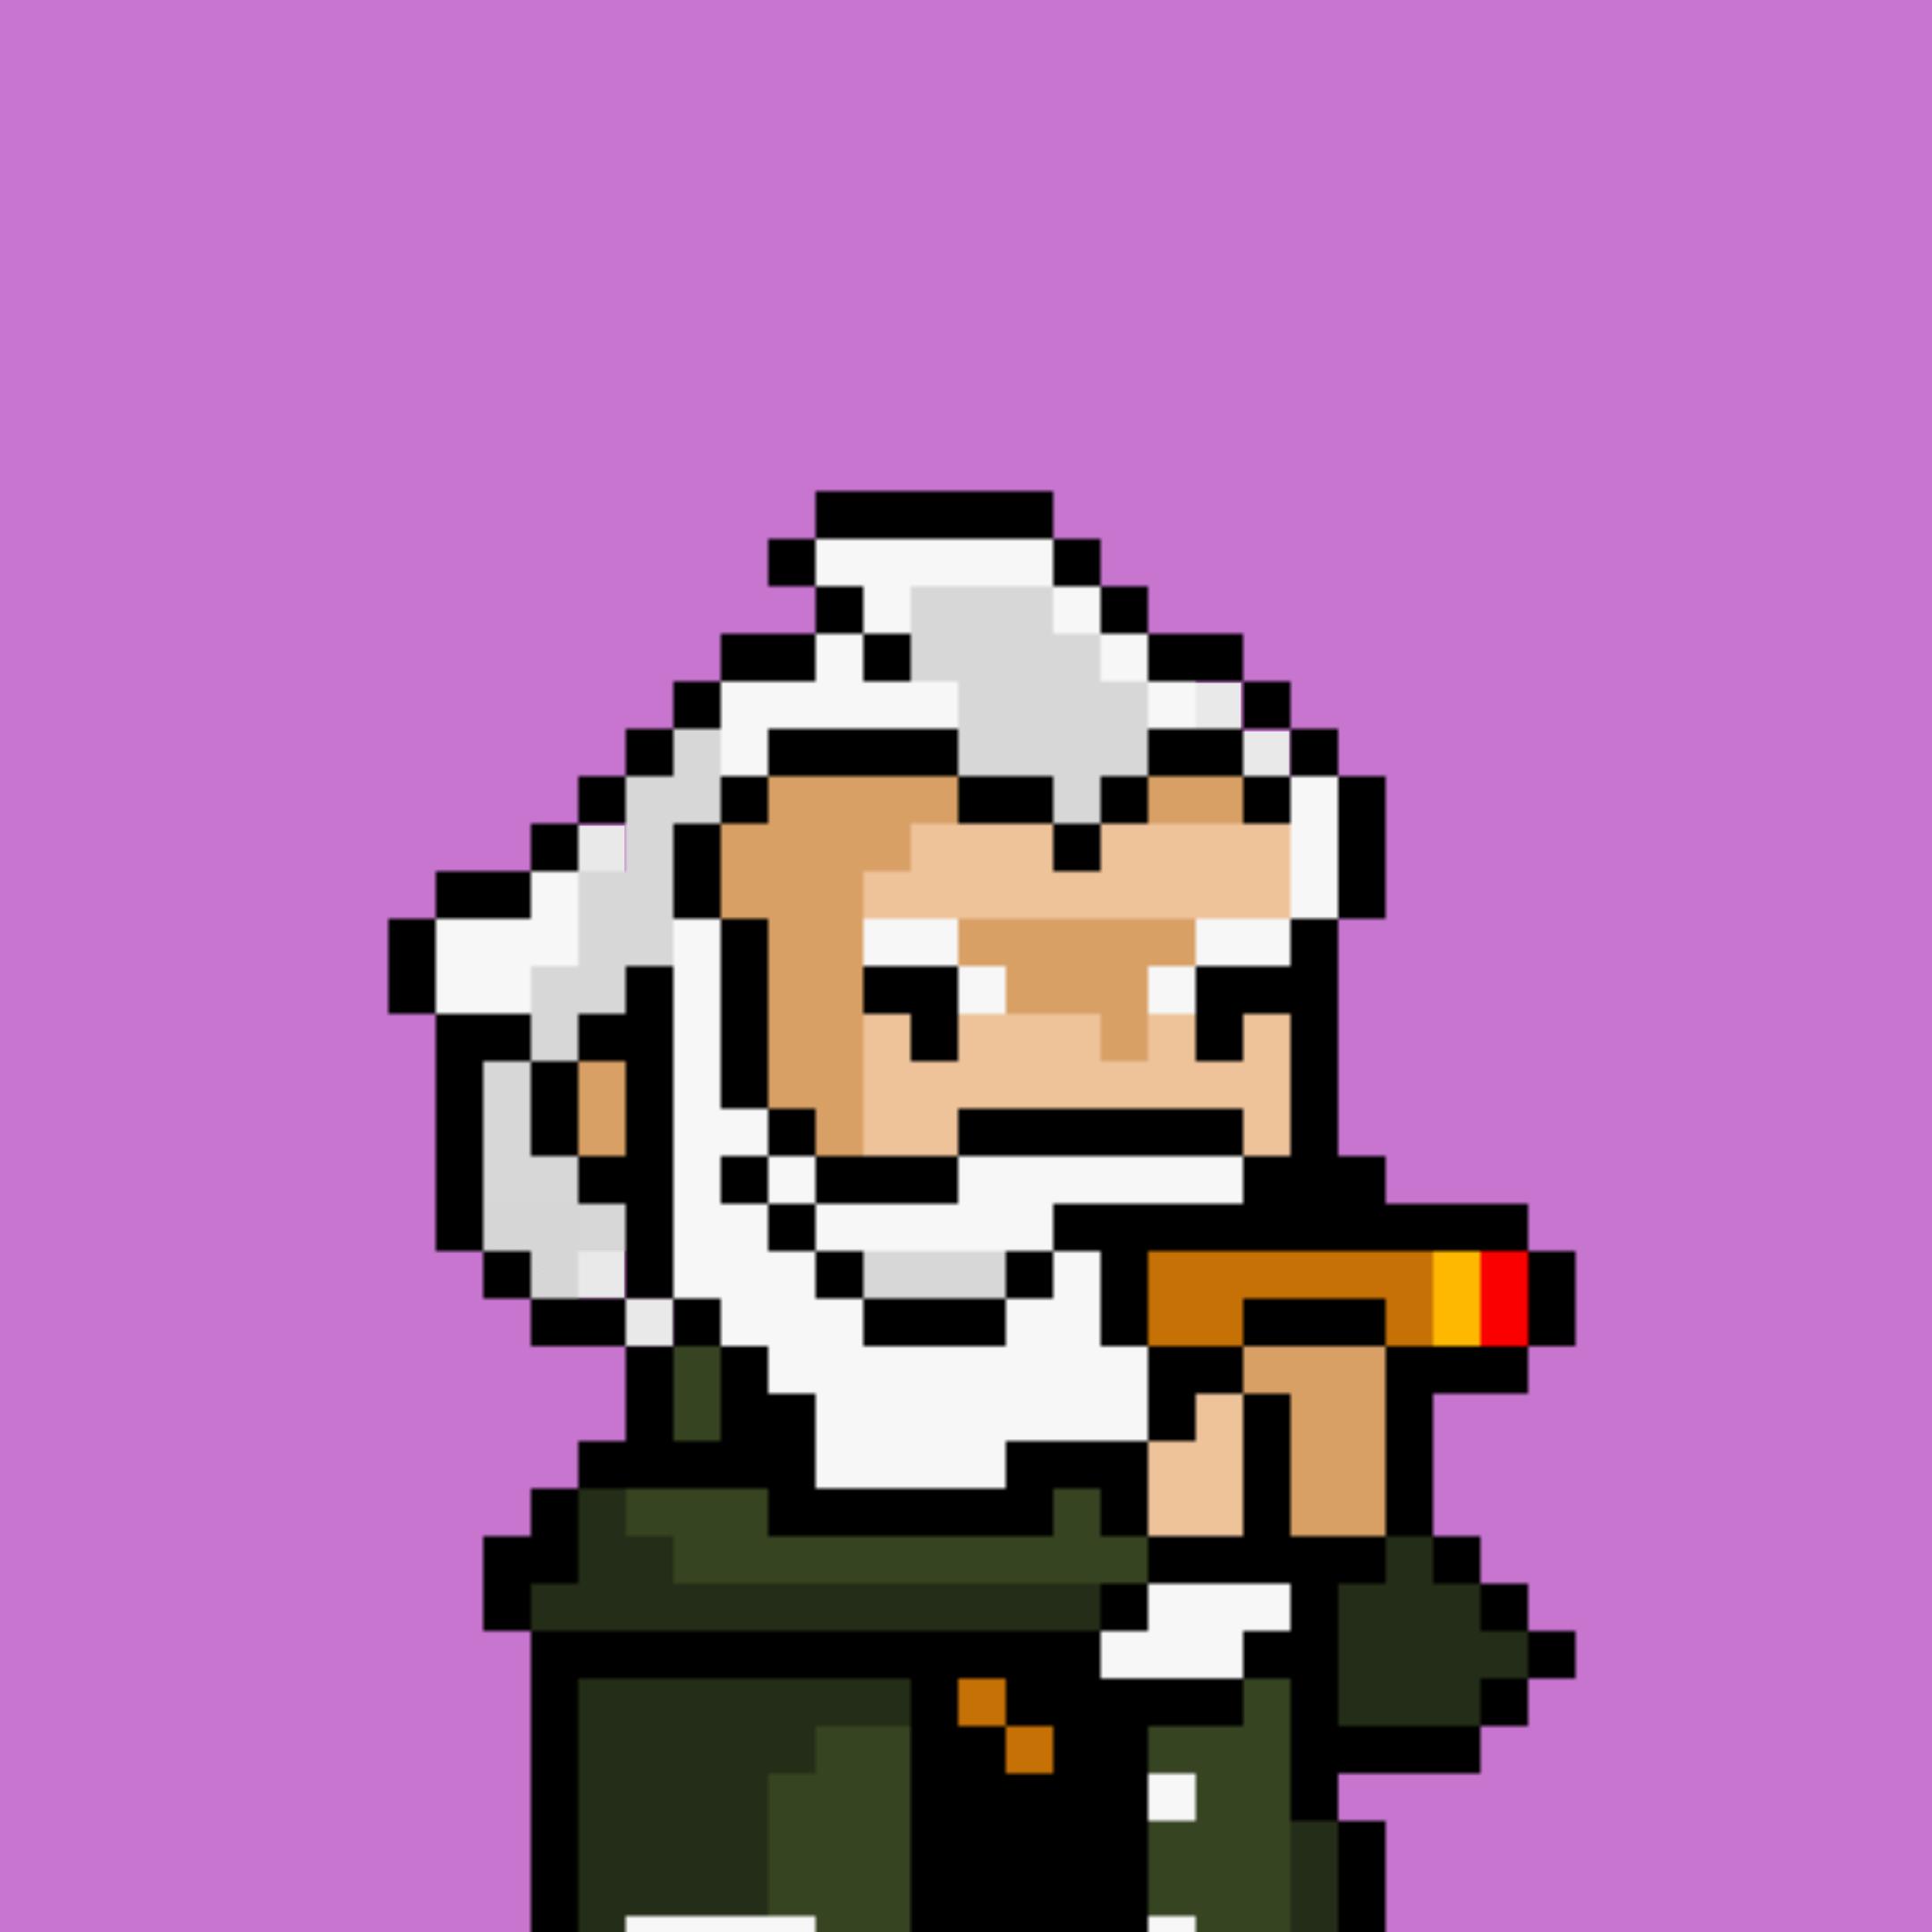 Brahms in pixel format